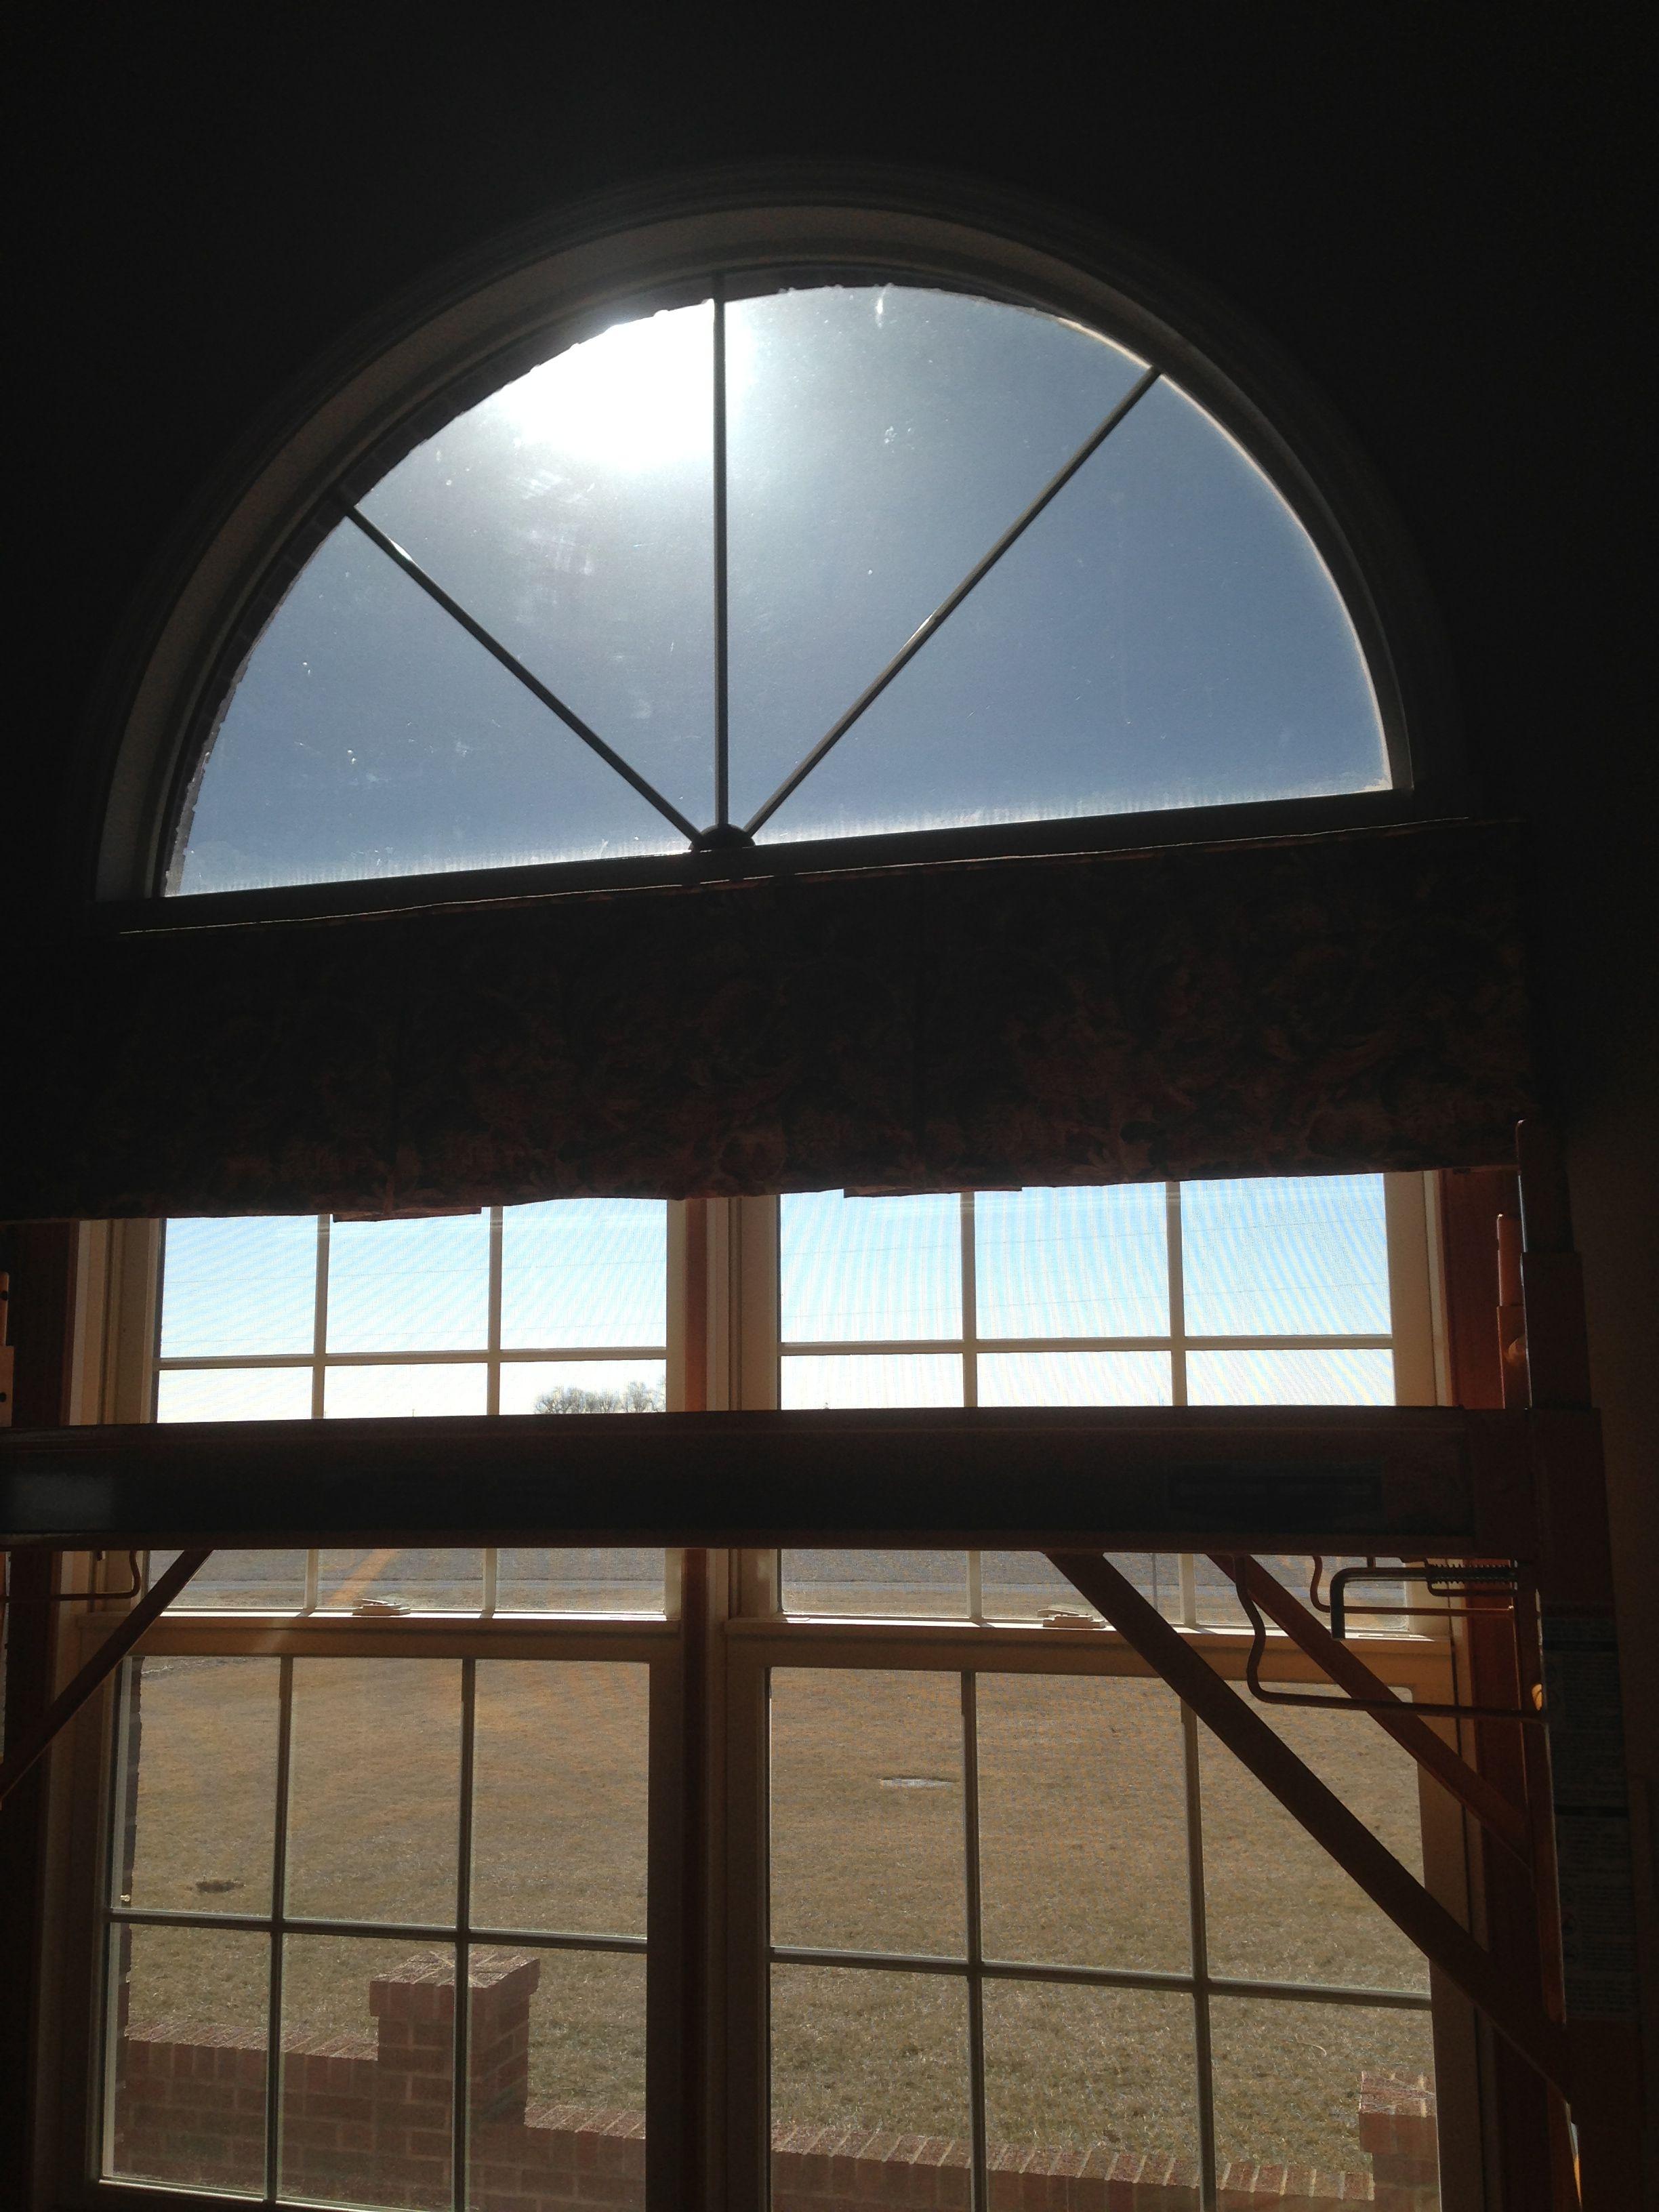 Window Tint On Residential Bay Window 25 Dual Reflective